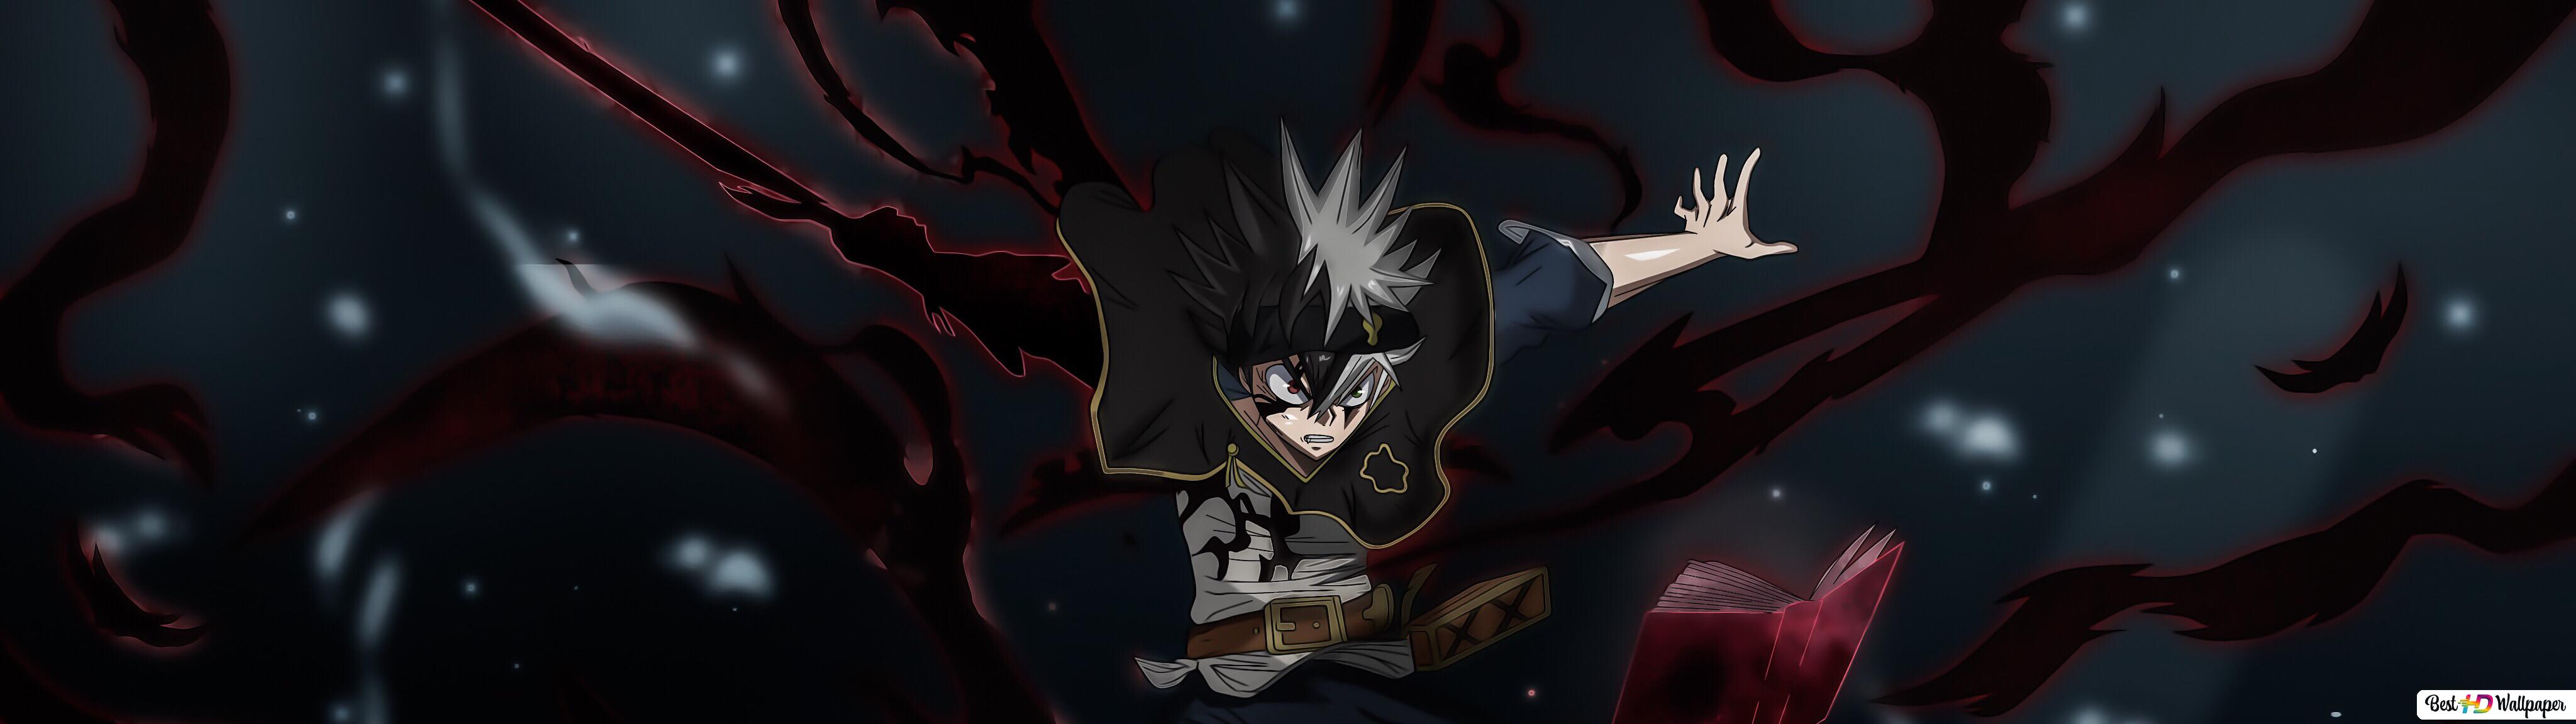 Black Clover - Asta HD wallpaper download